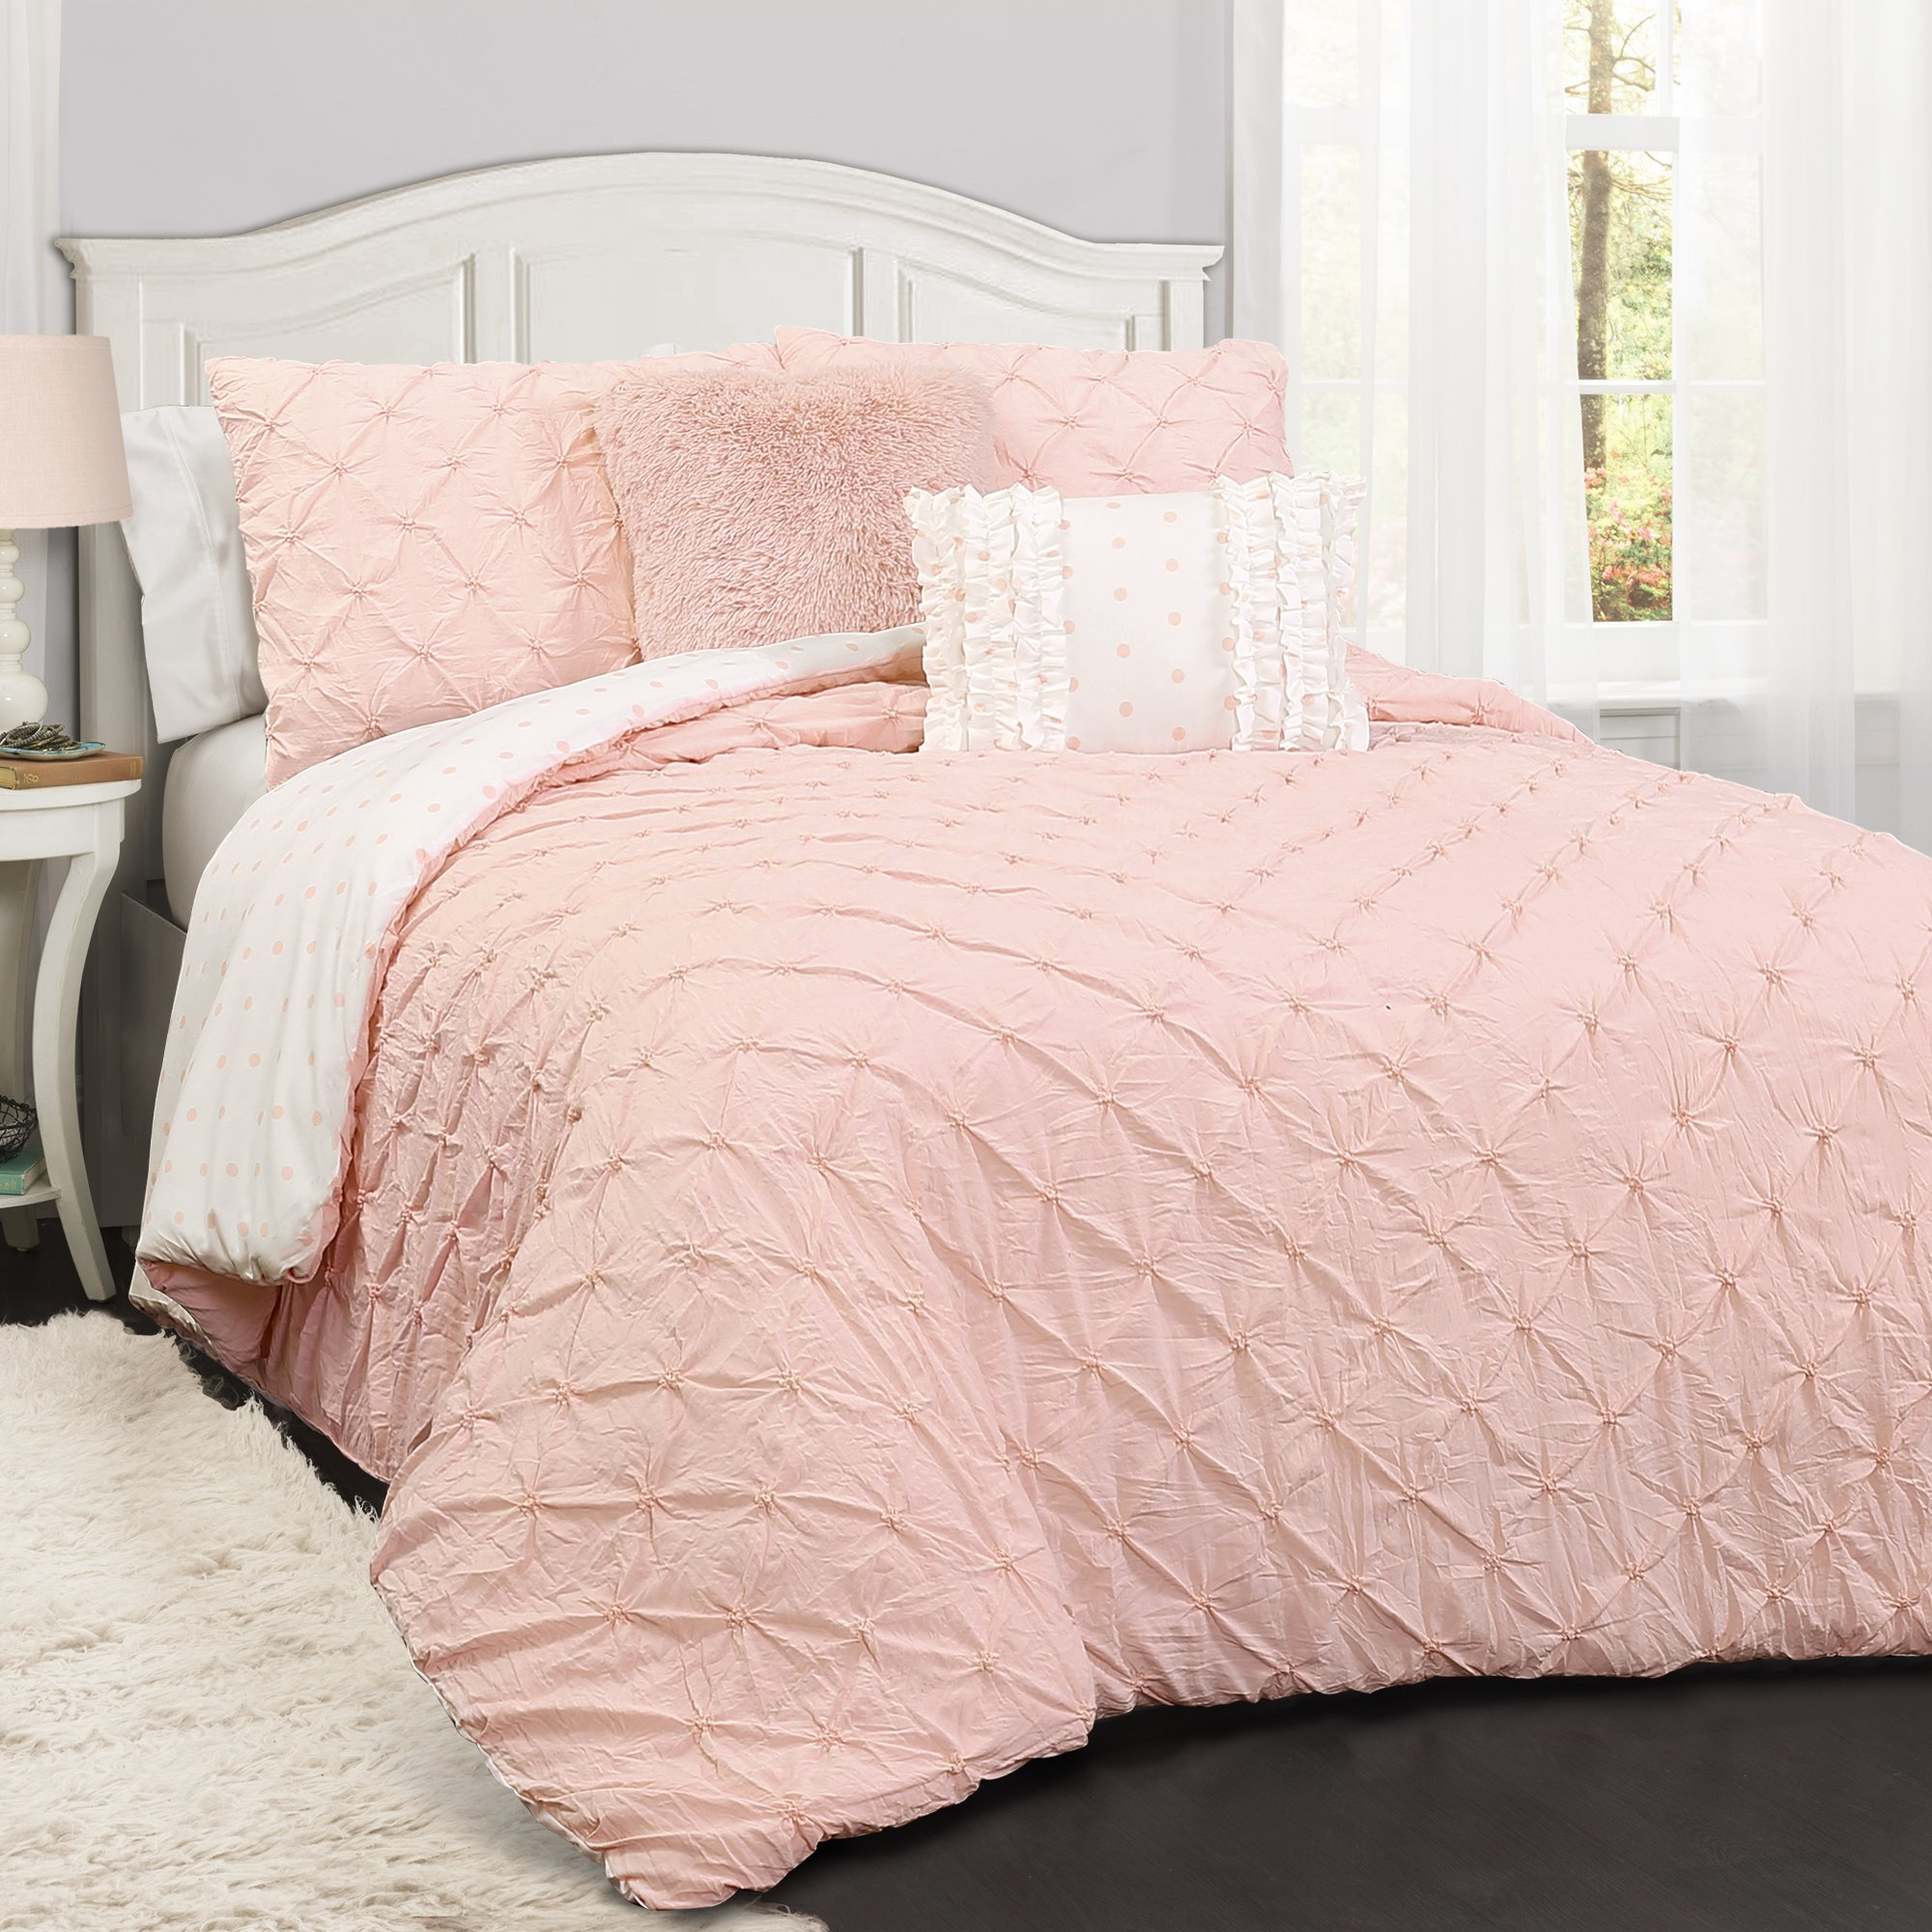 Lush Decor Lush Décor Ravello Pintuck 5 Piece Comforter Set, Full/Queen, Pink